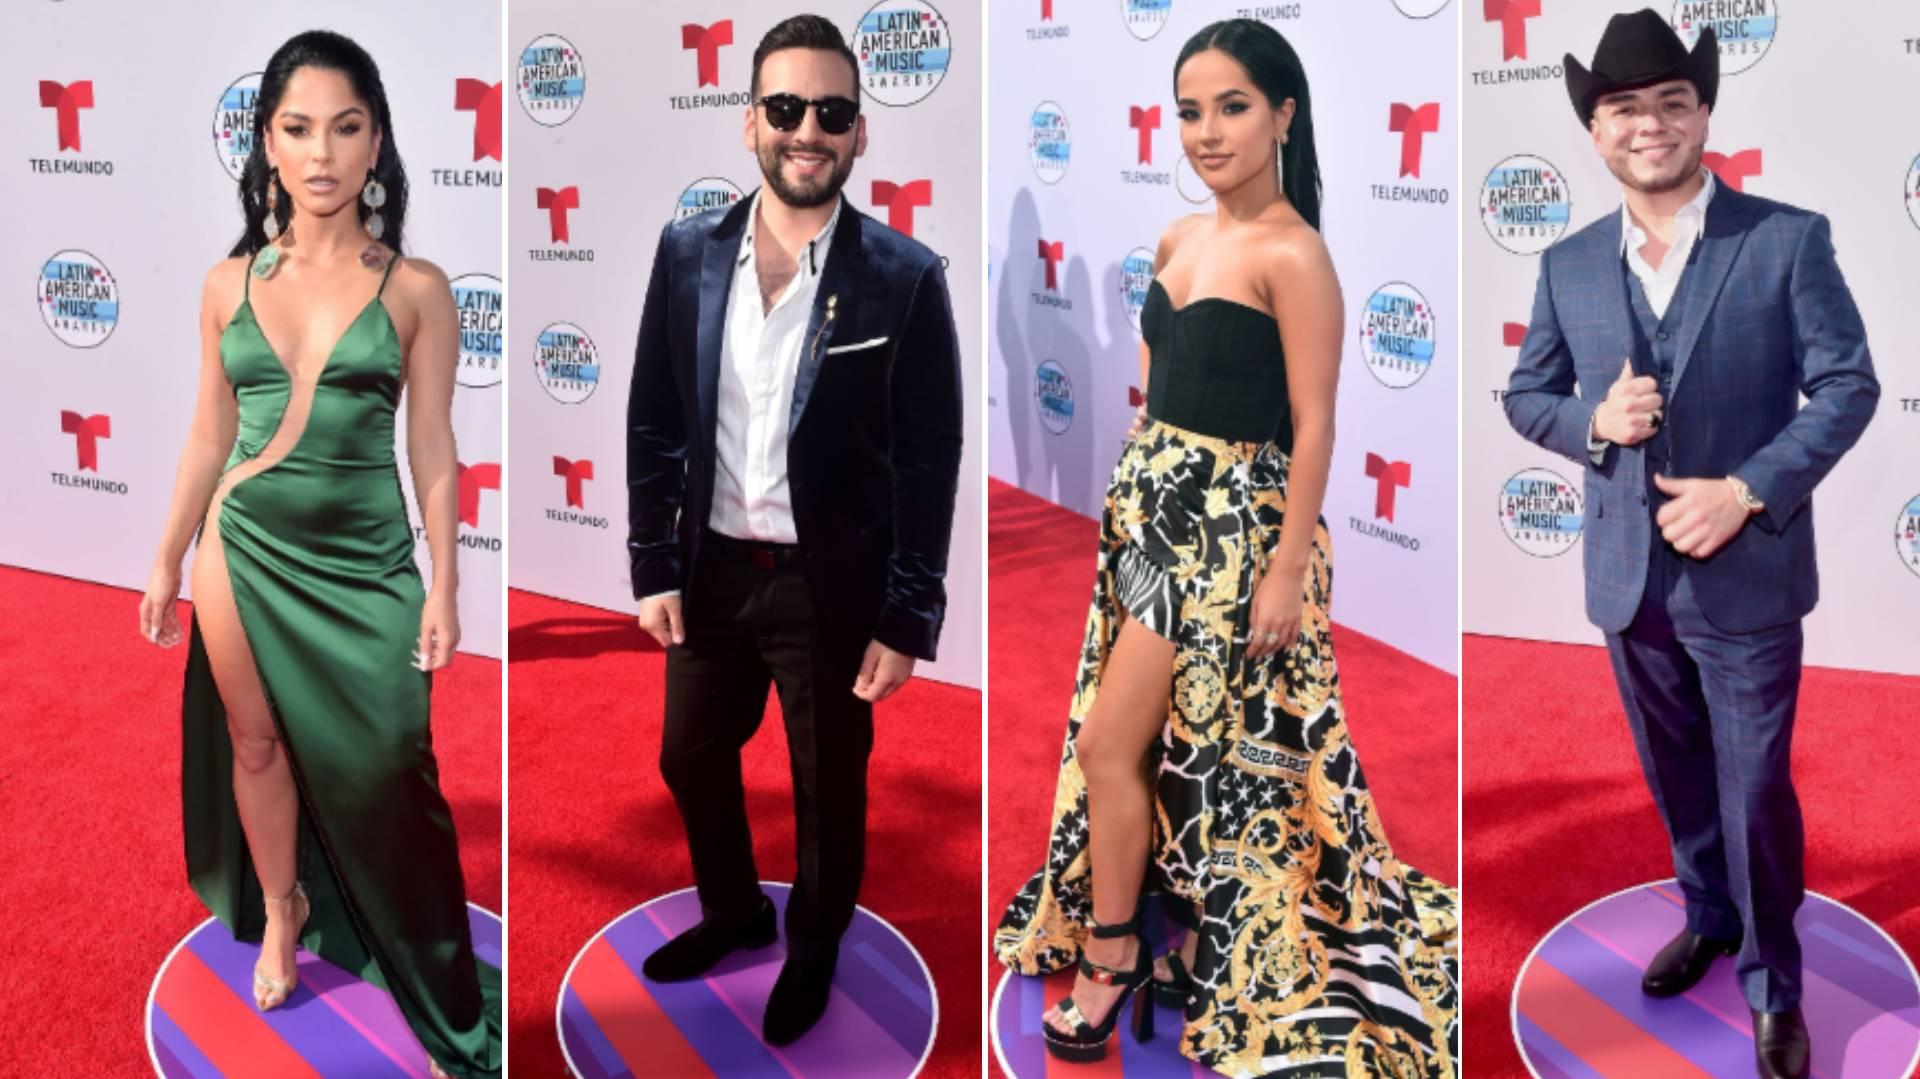 Las celebridades en los Latin American Music Awards 2019 (Foto: Telemundo Internacional @telemundointl)